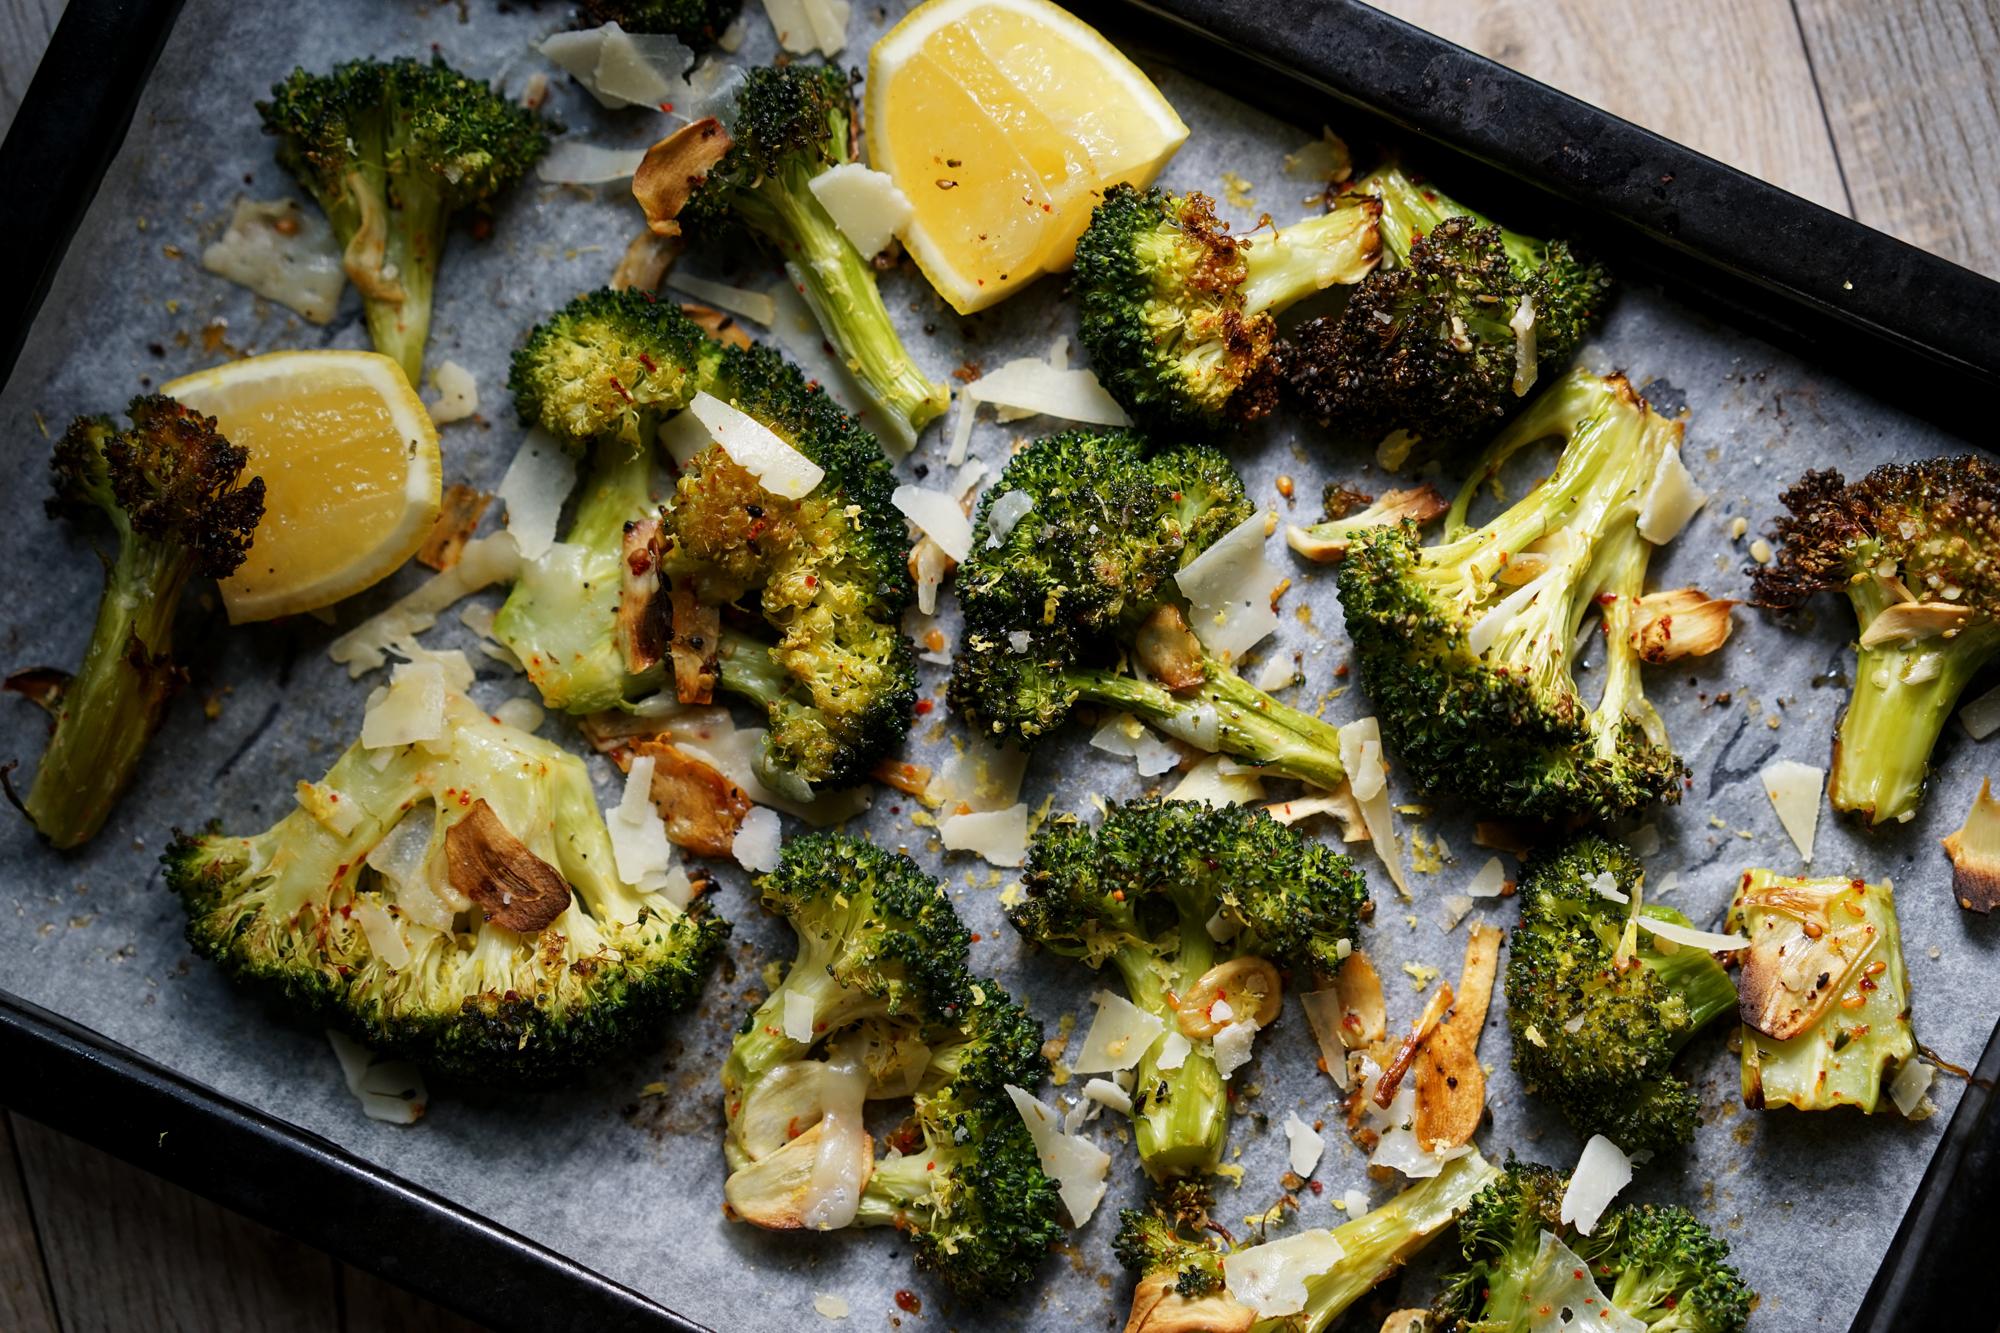 Crack Broccoli Recipe by Broke and Cooking - www.brokeandcooking.com